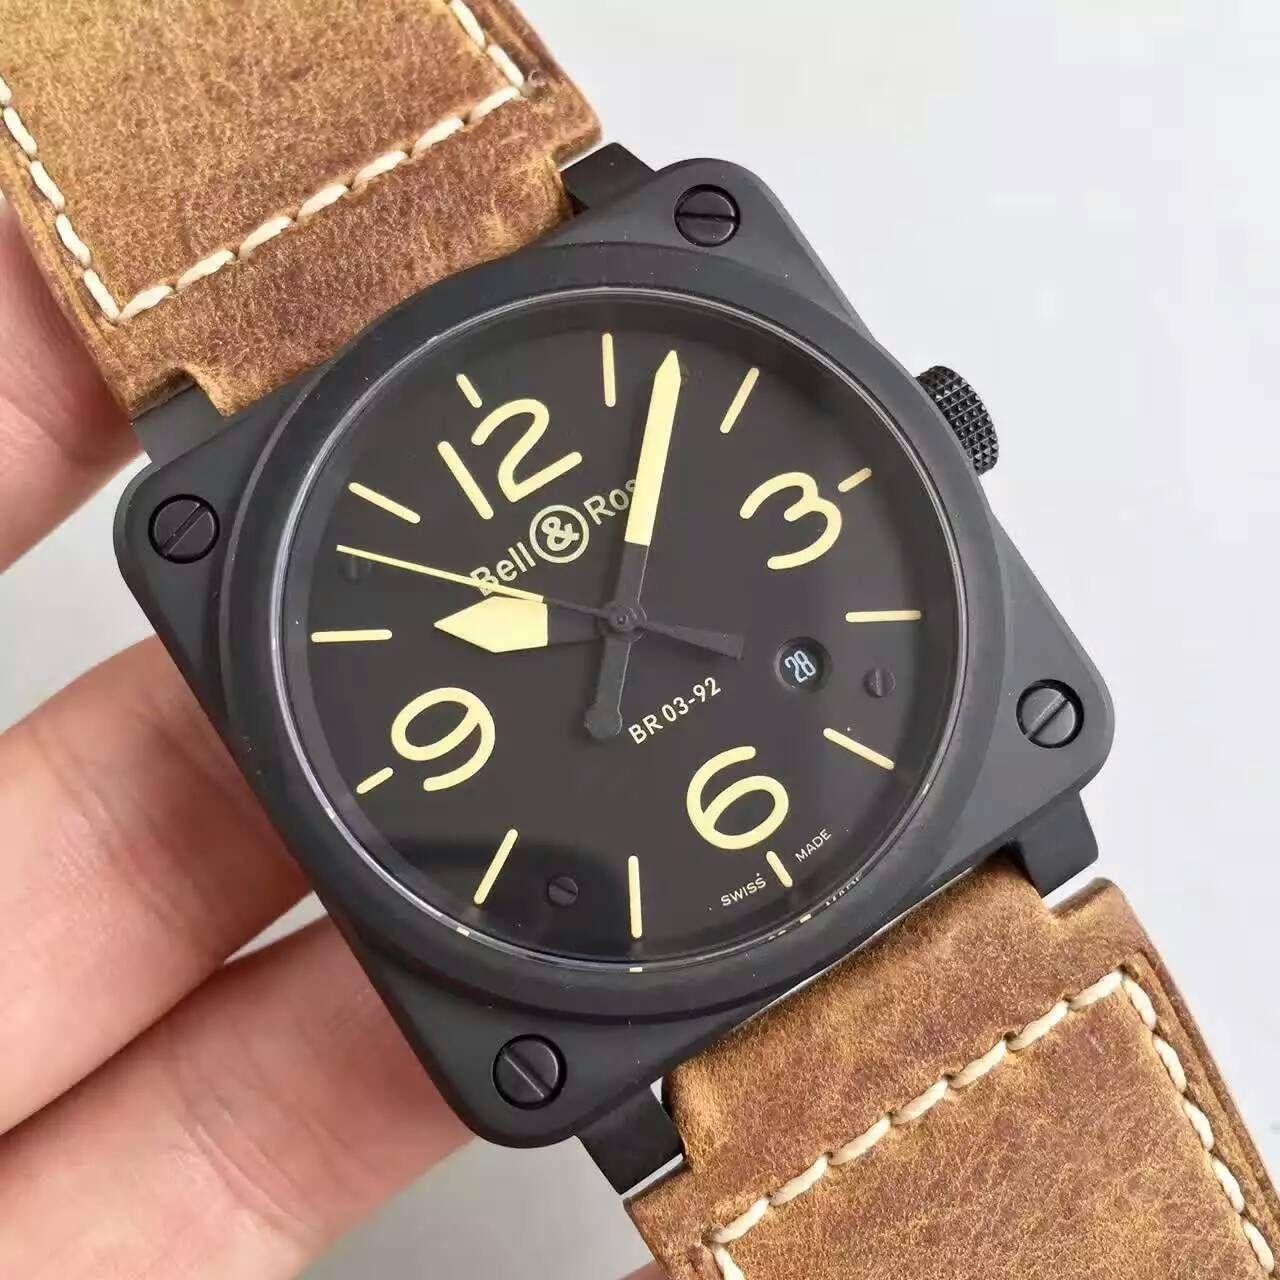 【BR厂超A1:1精仿手表】柏莱士AVIATION系列BR 03-92 HERITAGE腕表